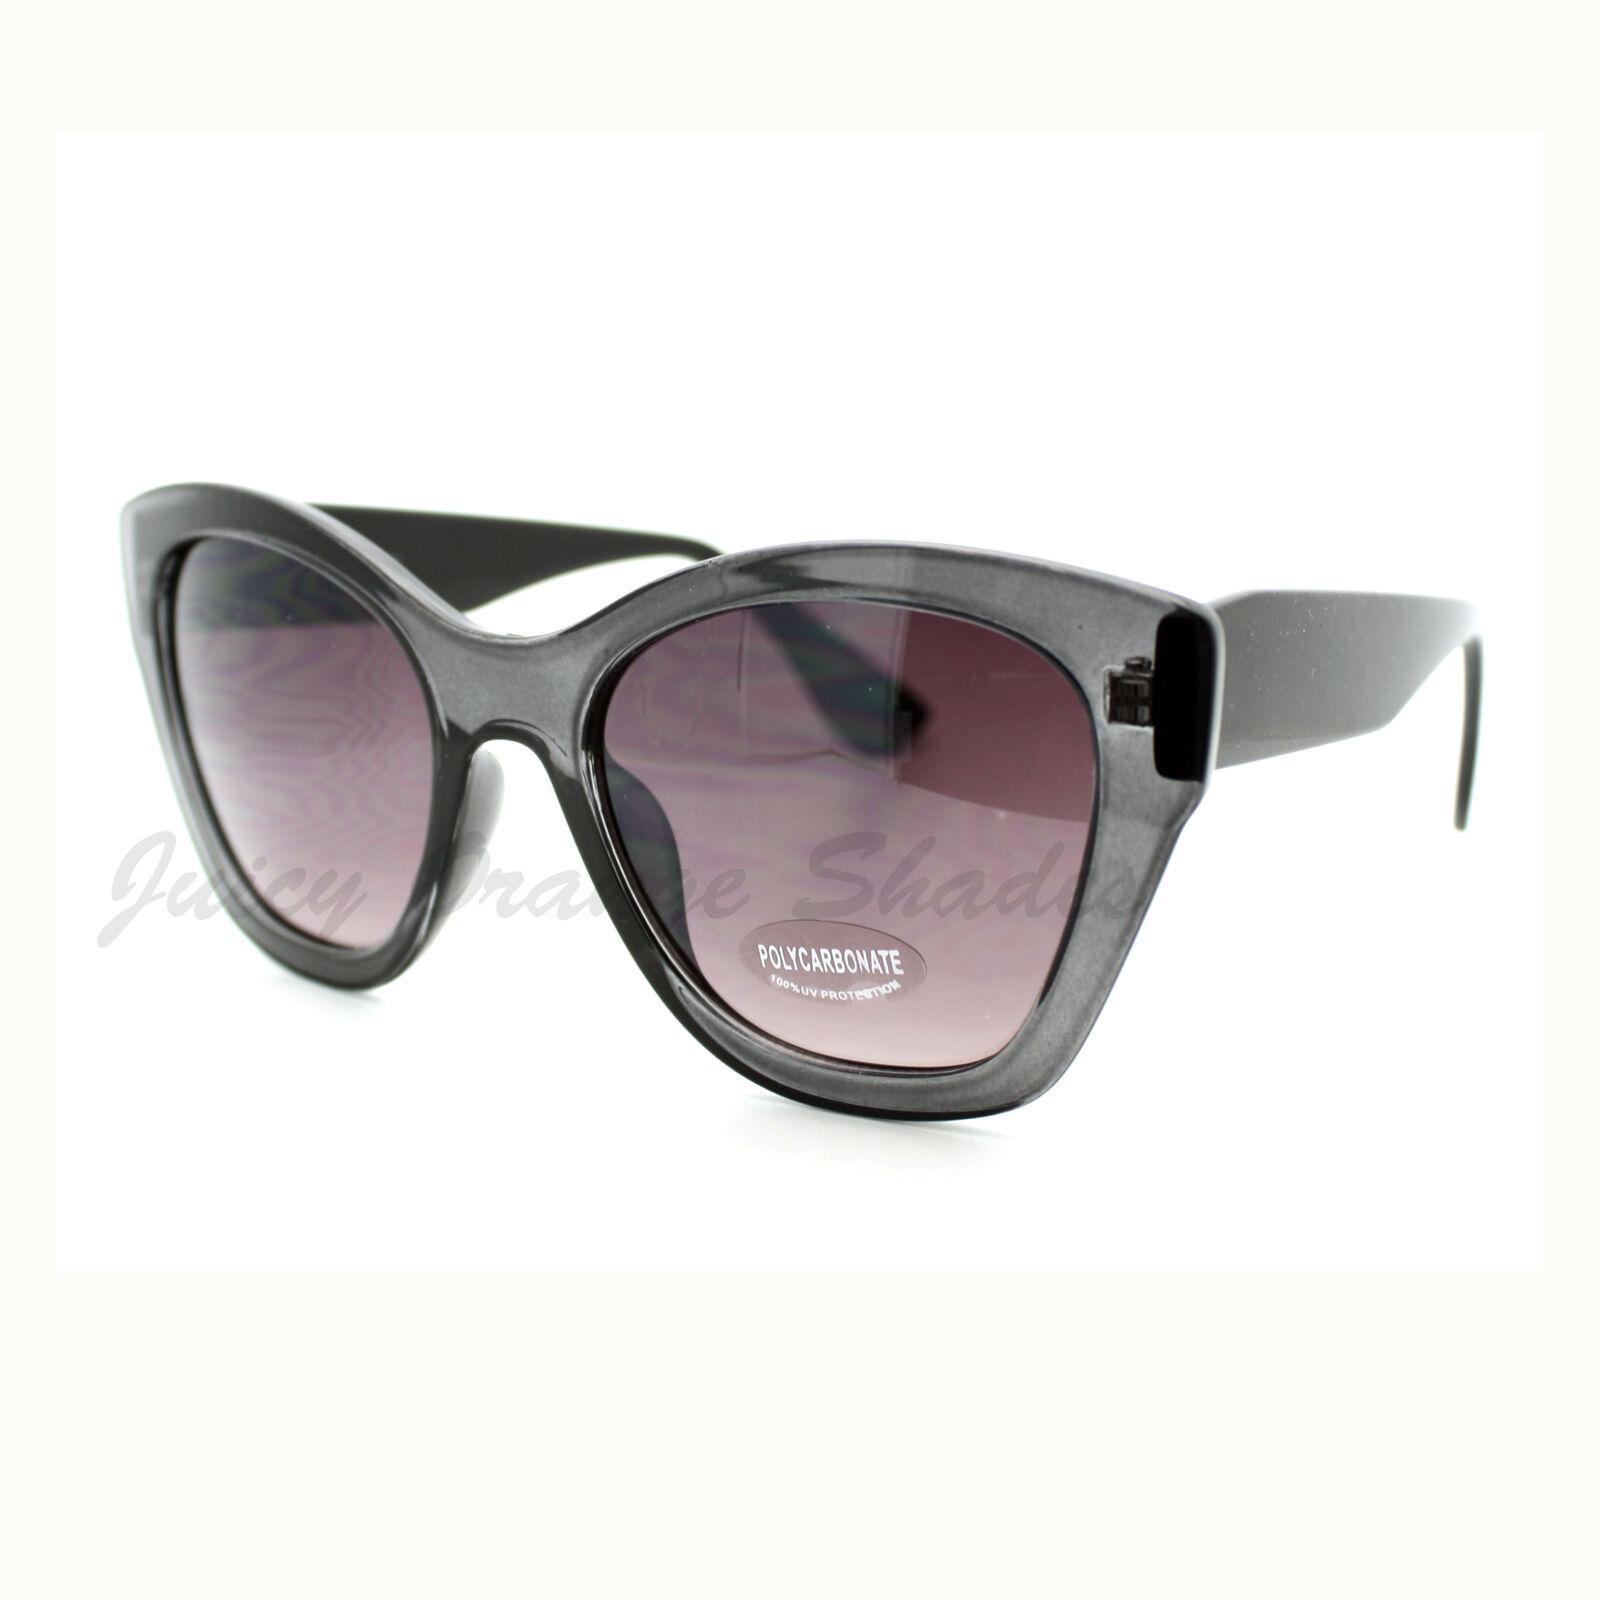 Women's Fashion Sunglasses Oversized Butterfly Square Cateye